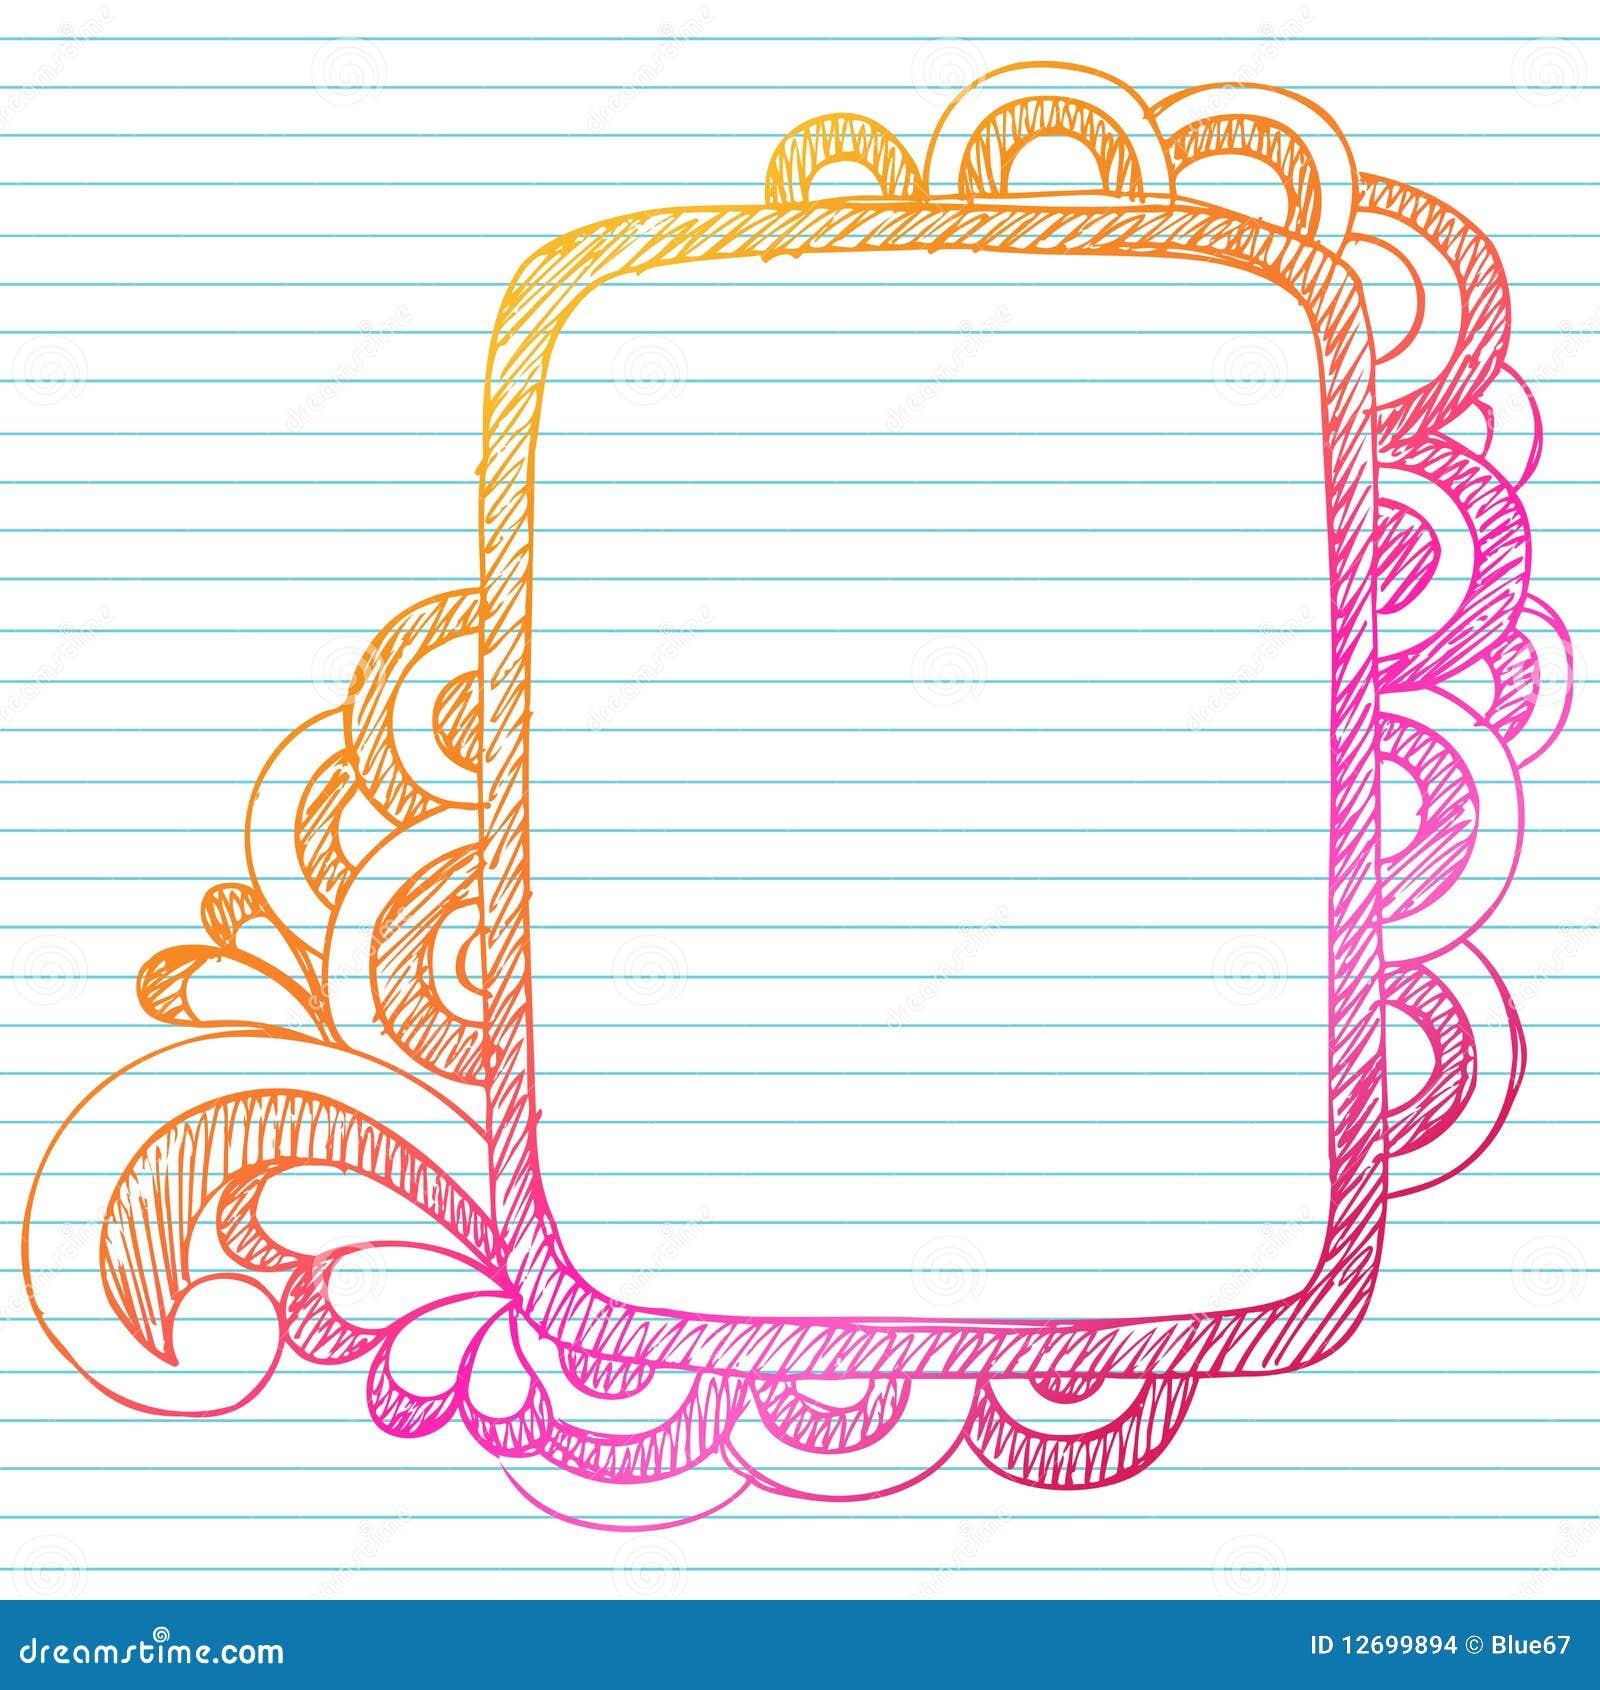 handdrawn sketchy doodle frame stock vector